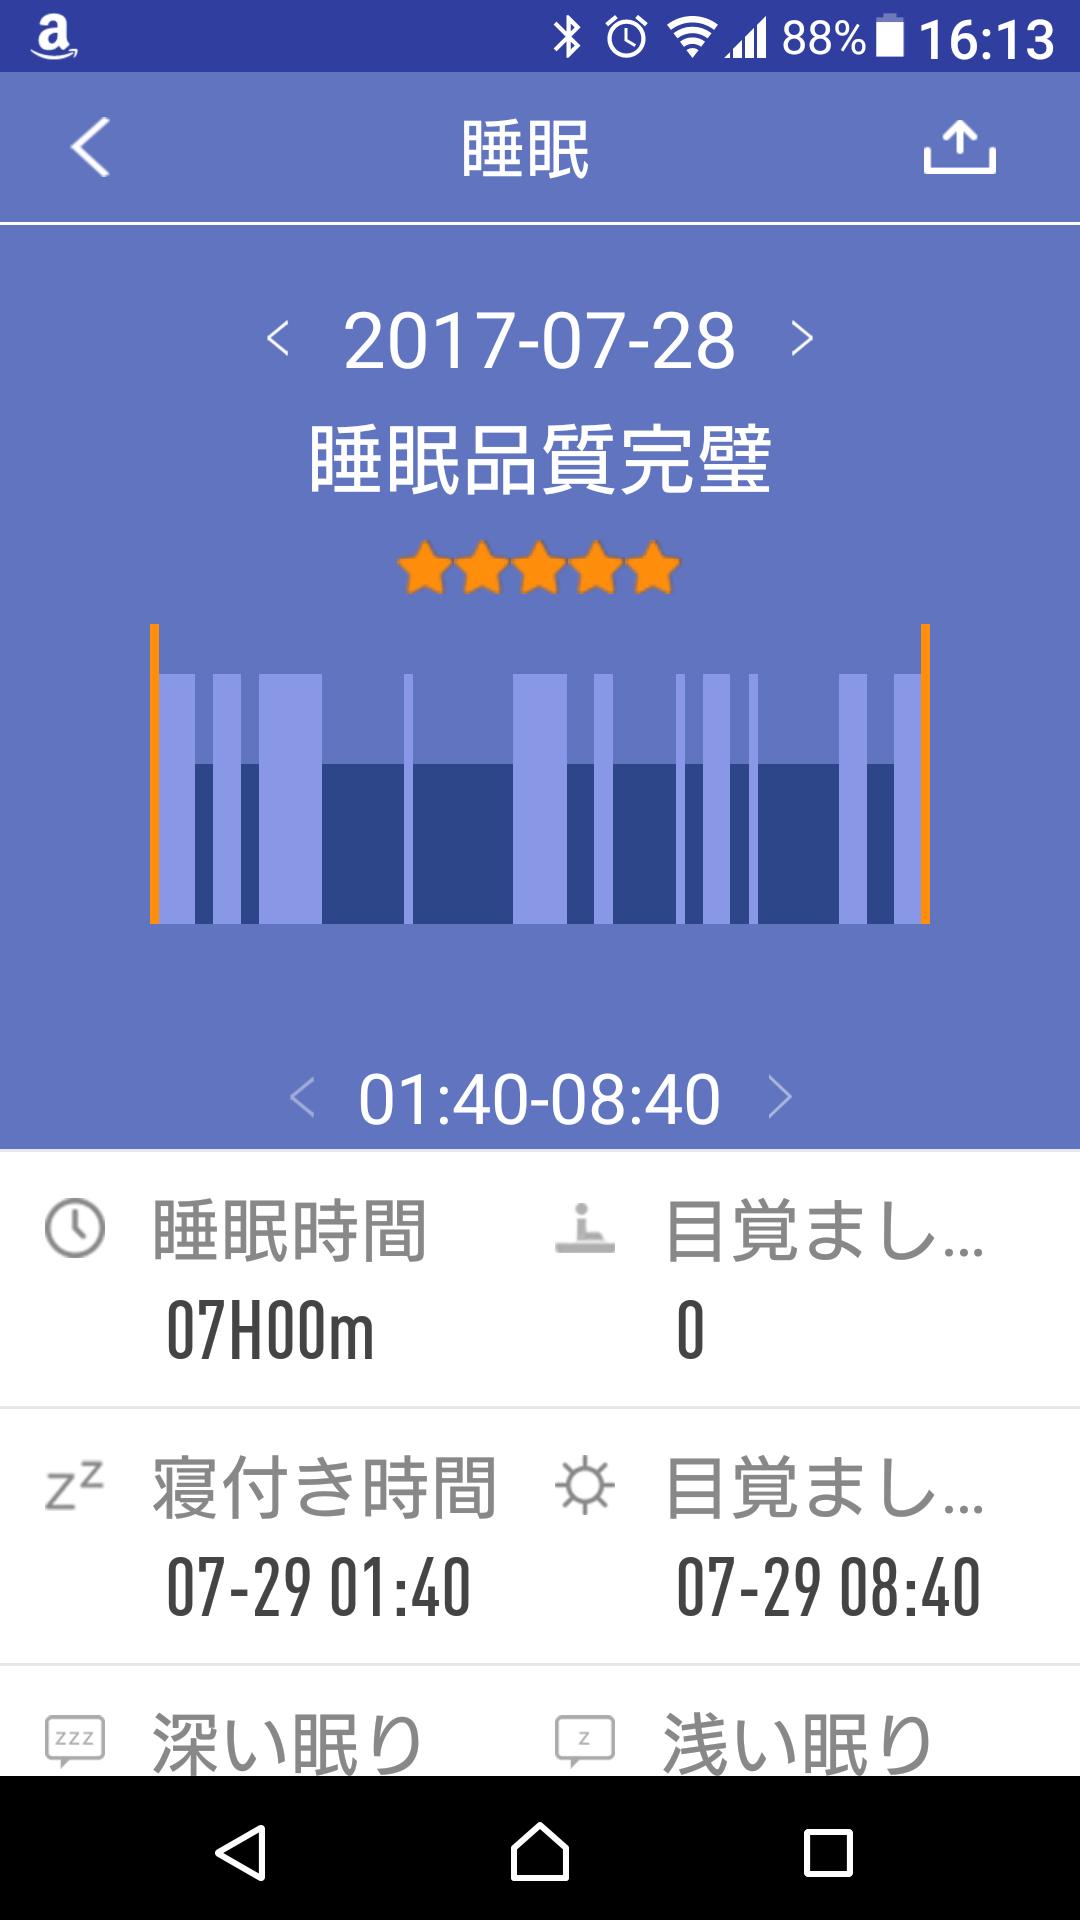 Screenshot_20170731-161313.png